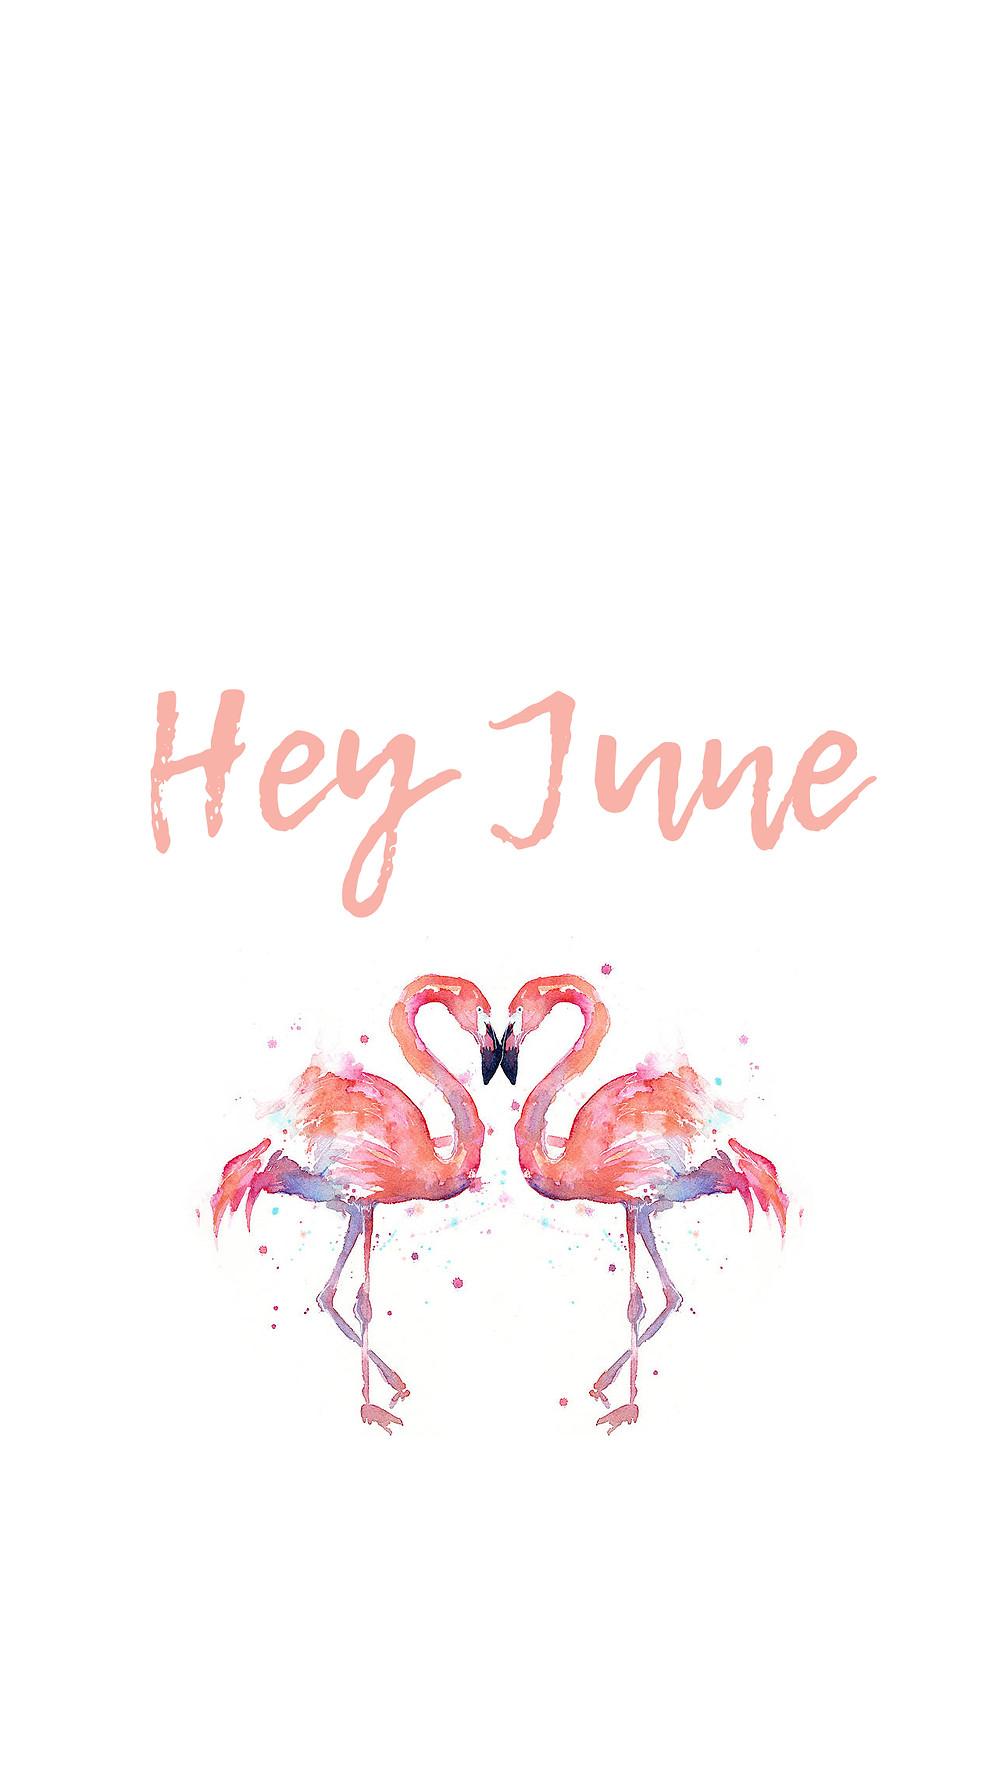 June 2017 Flamingo tech phone and desktop background wallpaper free download